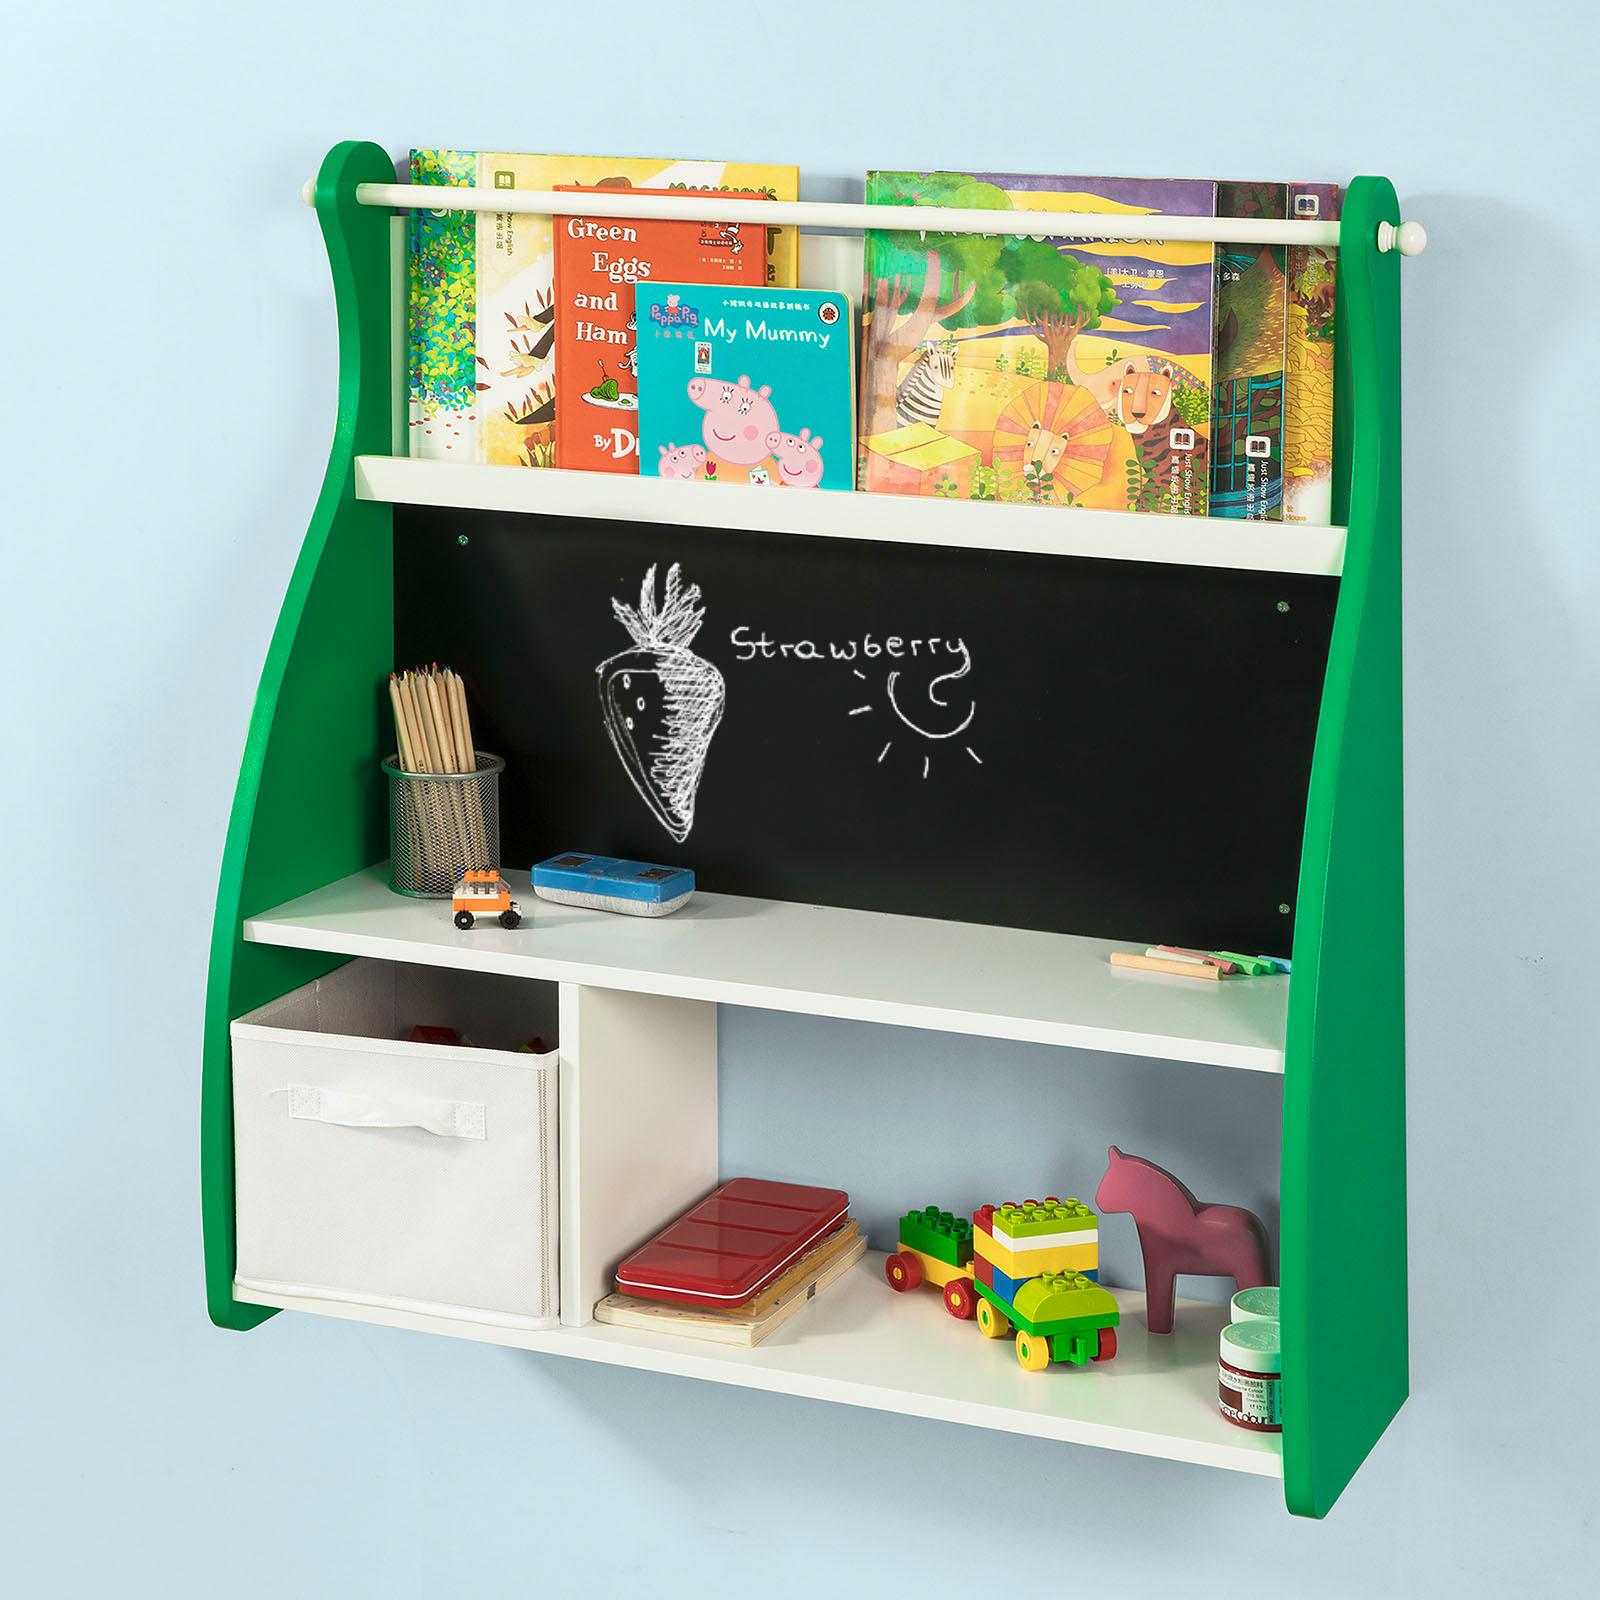 Full Size of Kinderzimmer Bücherregal 5bc06e0f8c95b Regal Weiß Sofa Regale Kinderzimmer Kinderzimmer Bücherregal